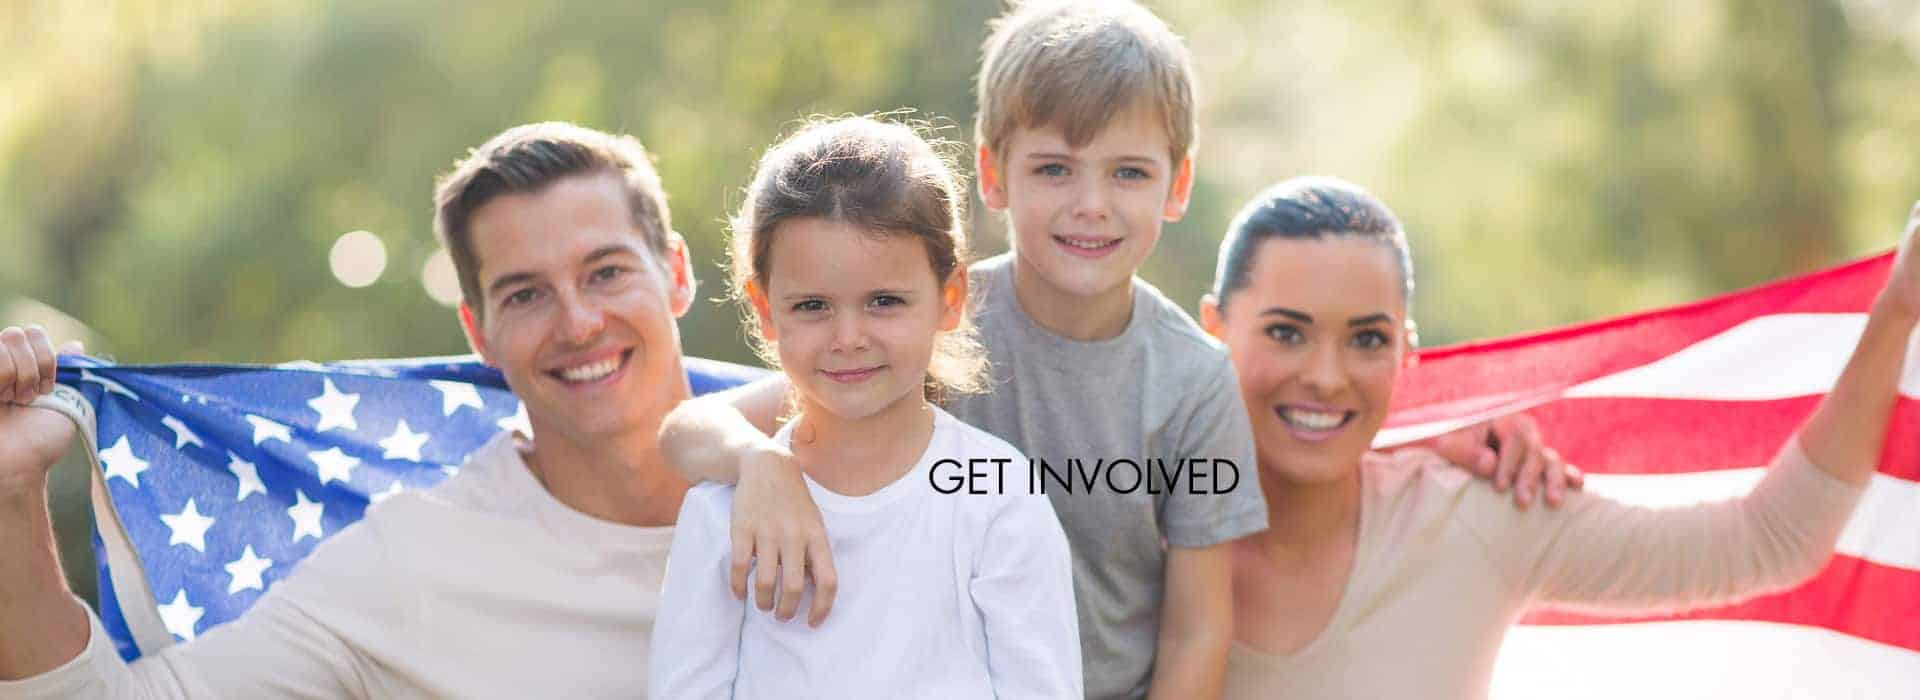 Get Involved Homeschool